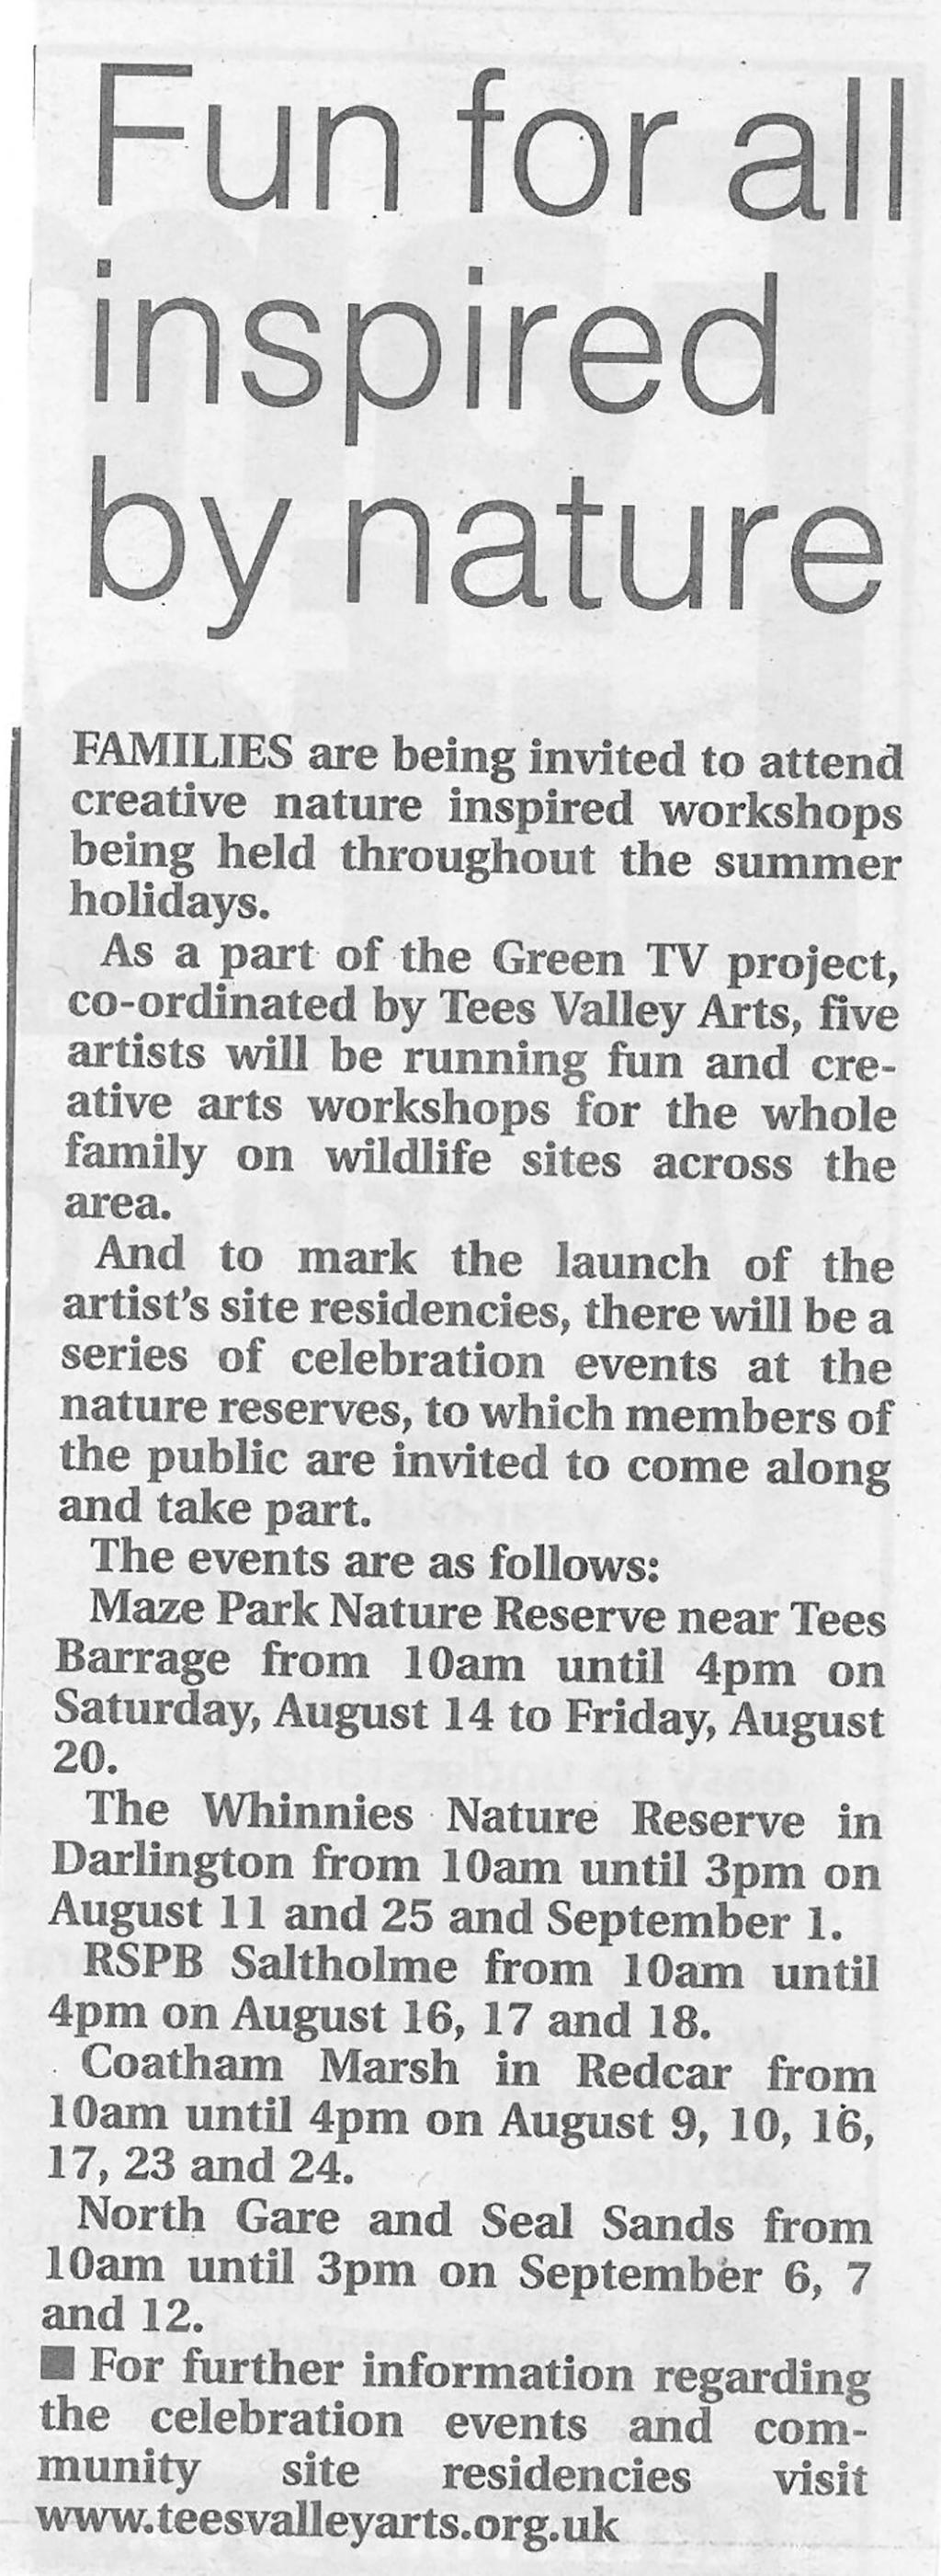 2010-08-06, Evening Gazette